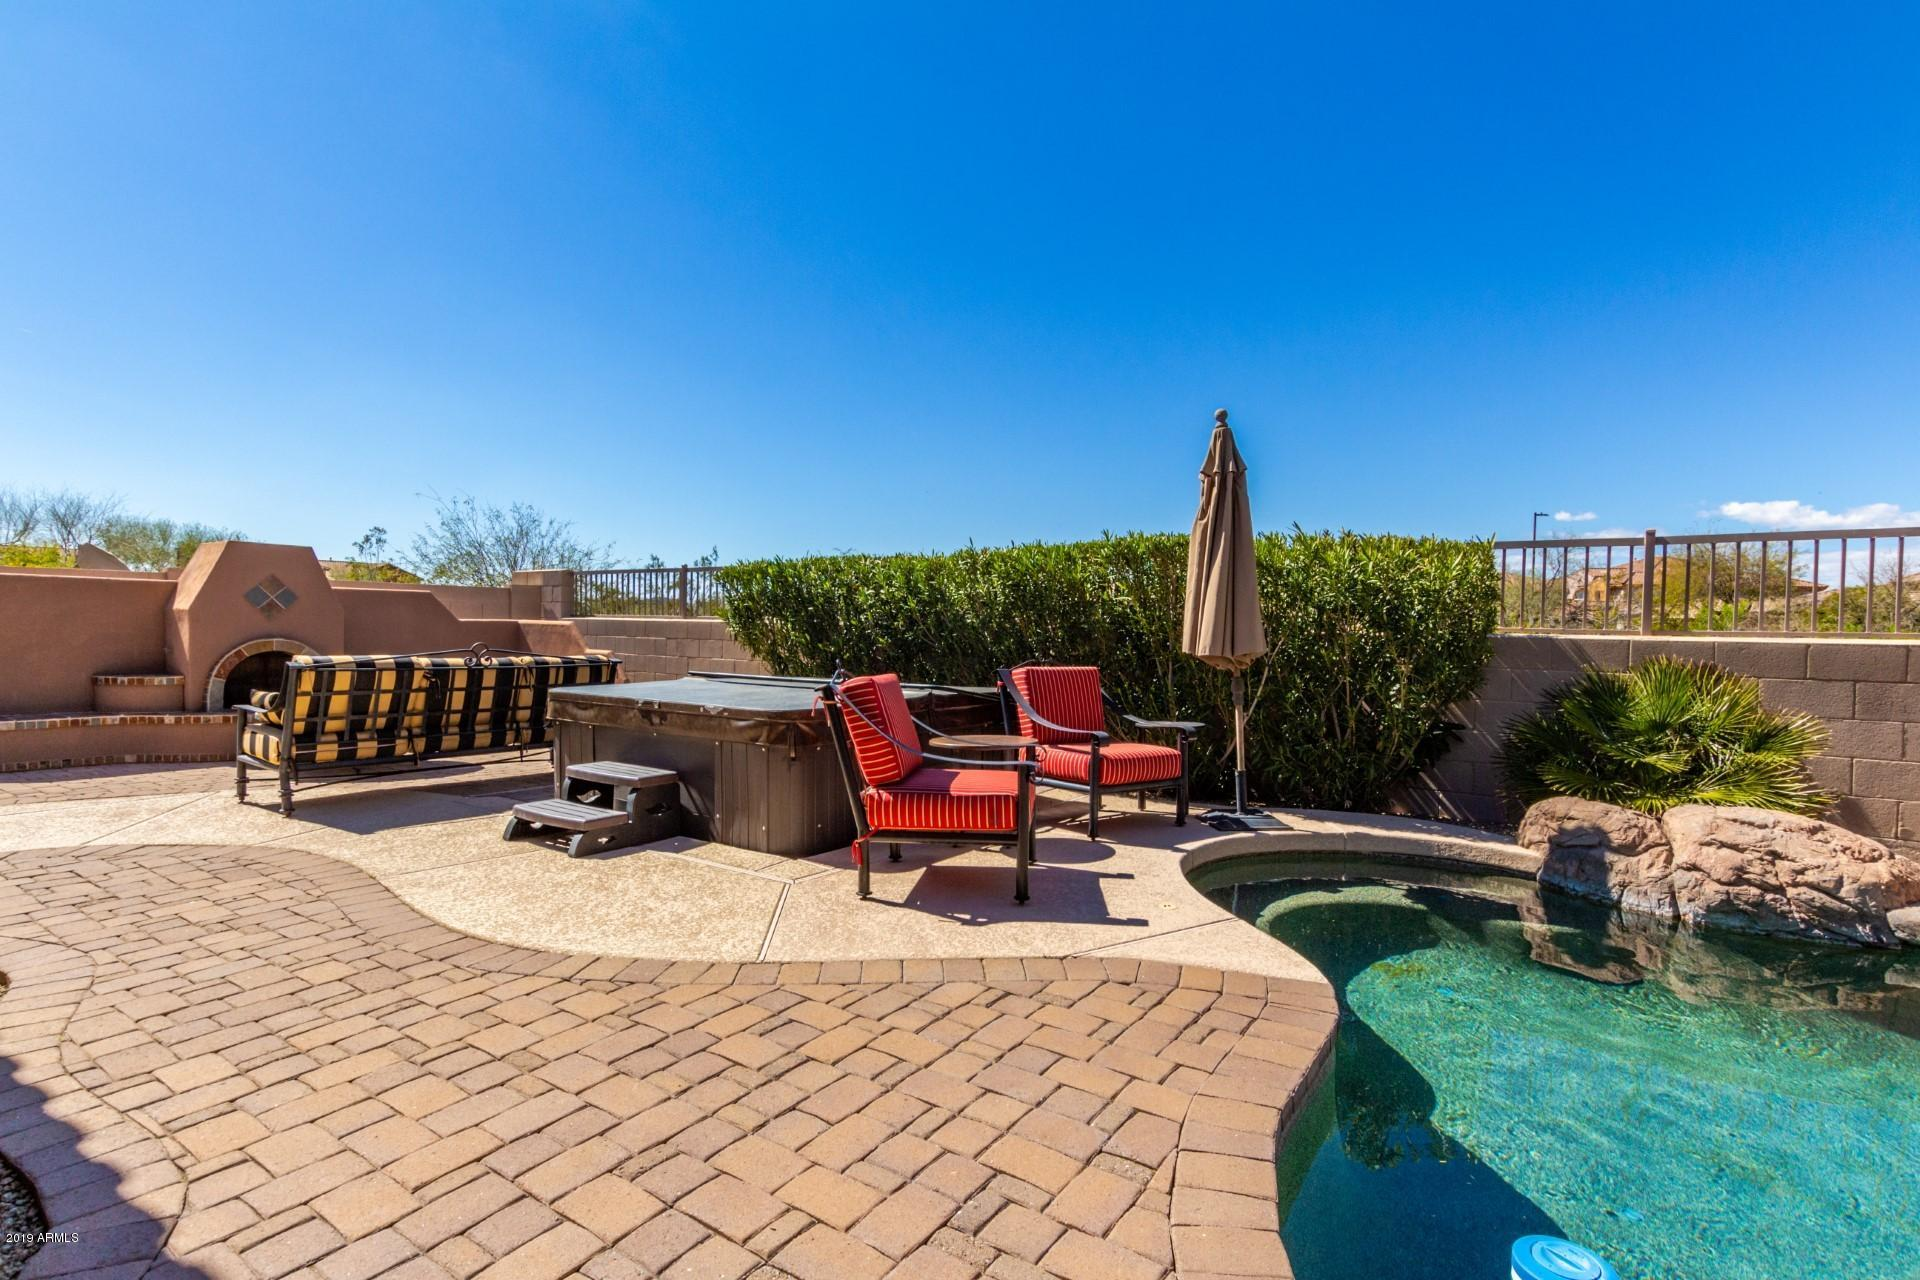 Photo for 23106 N 39th Place, Phoenix, AZ 85050 (MLS # 5896603)